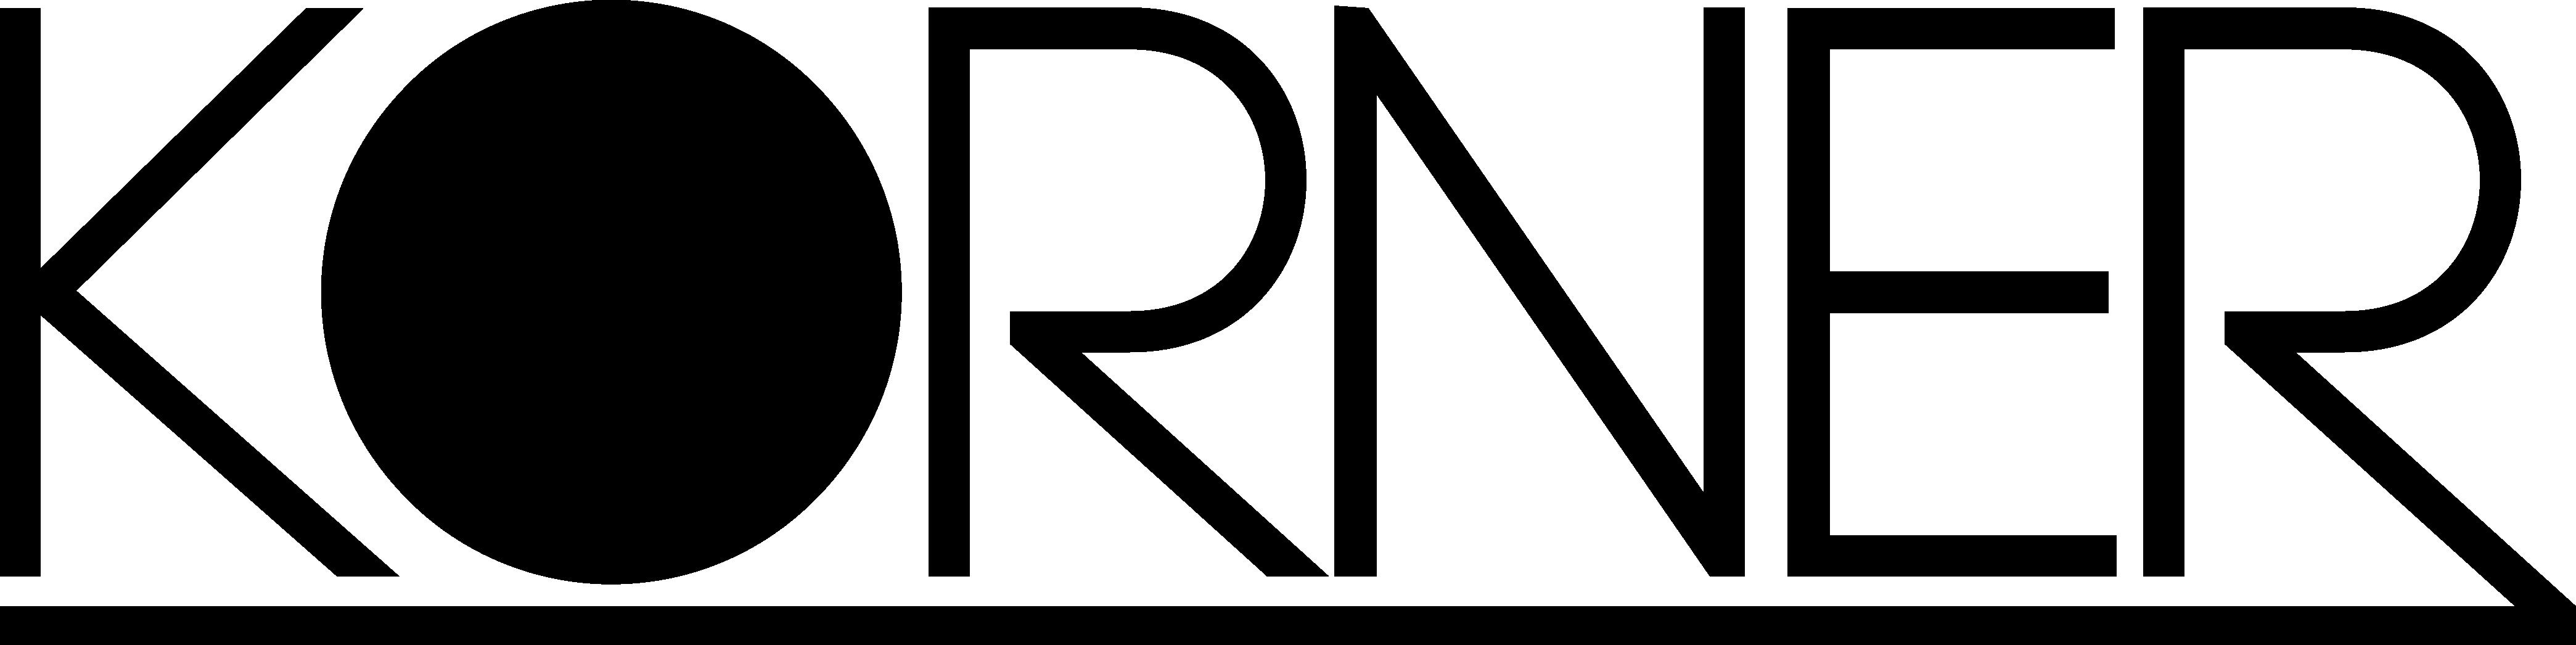 Korner Store Udine Logo